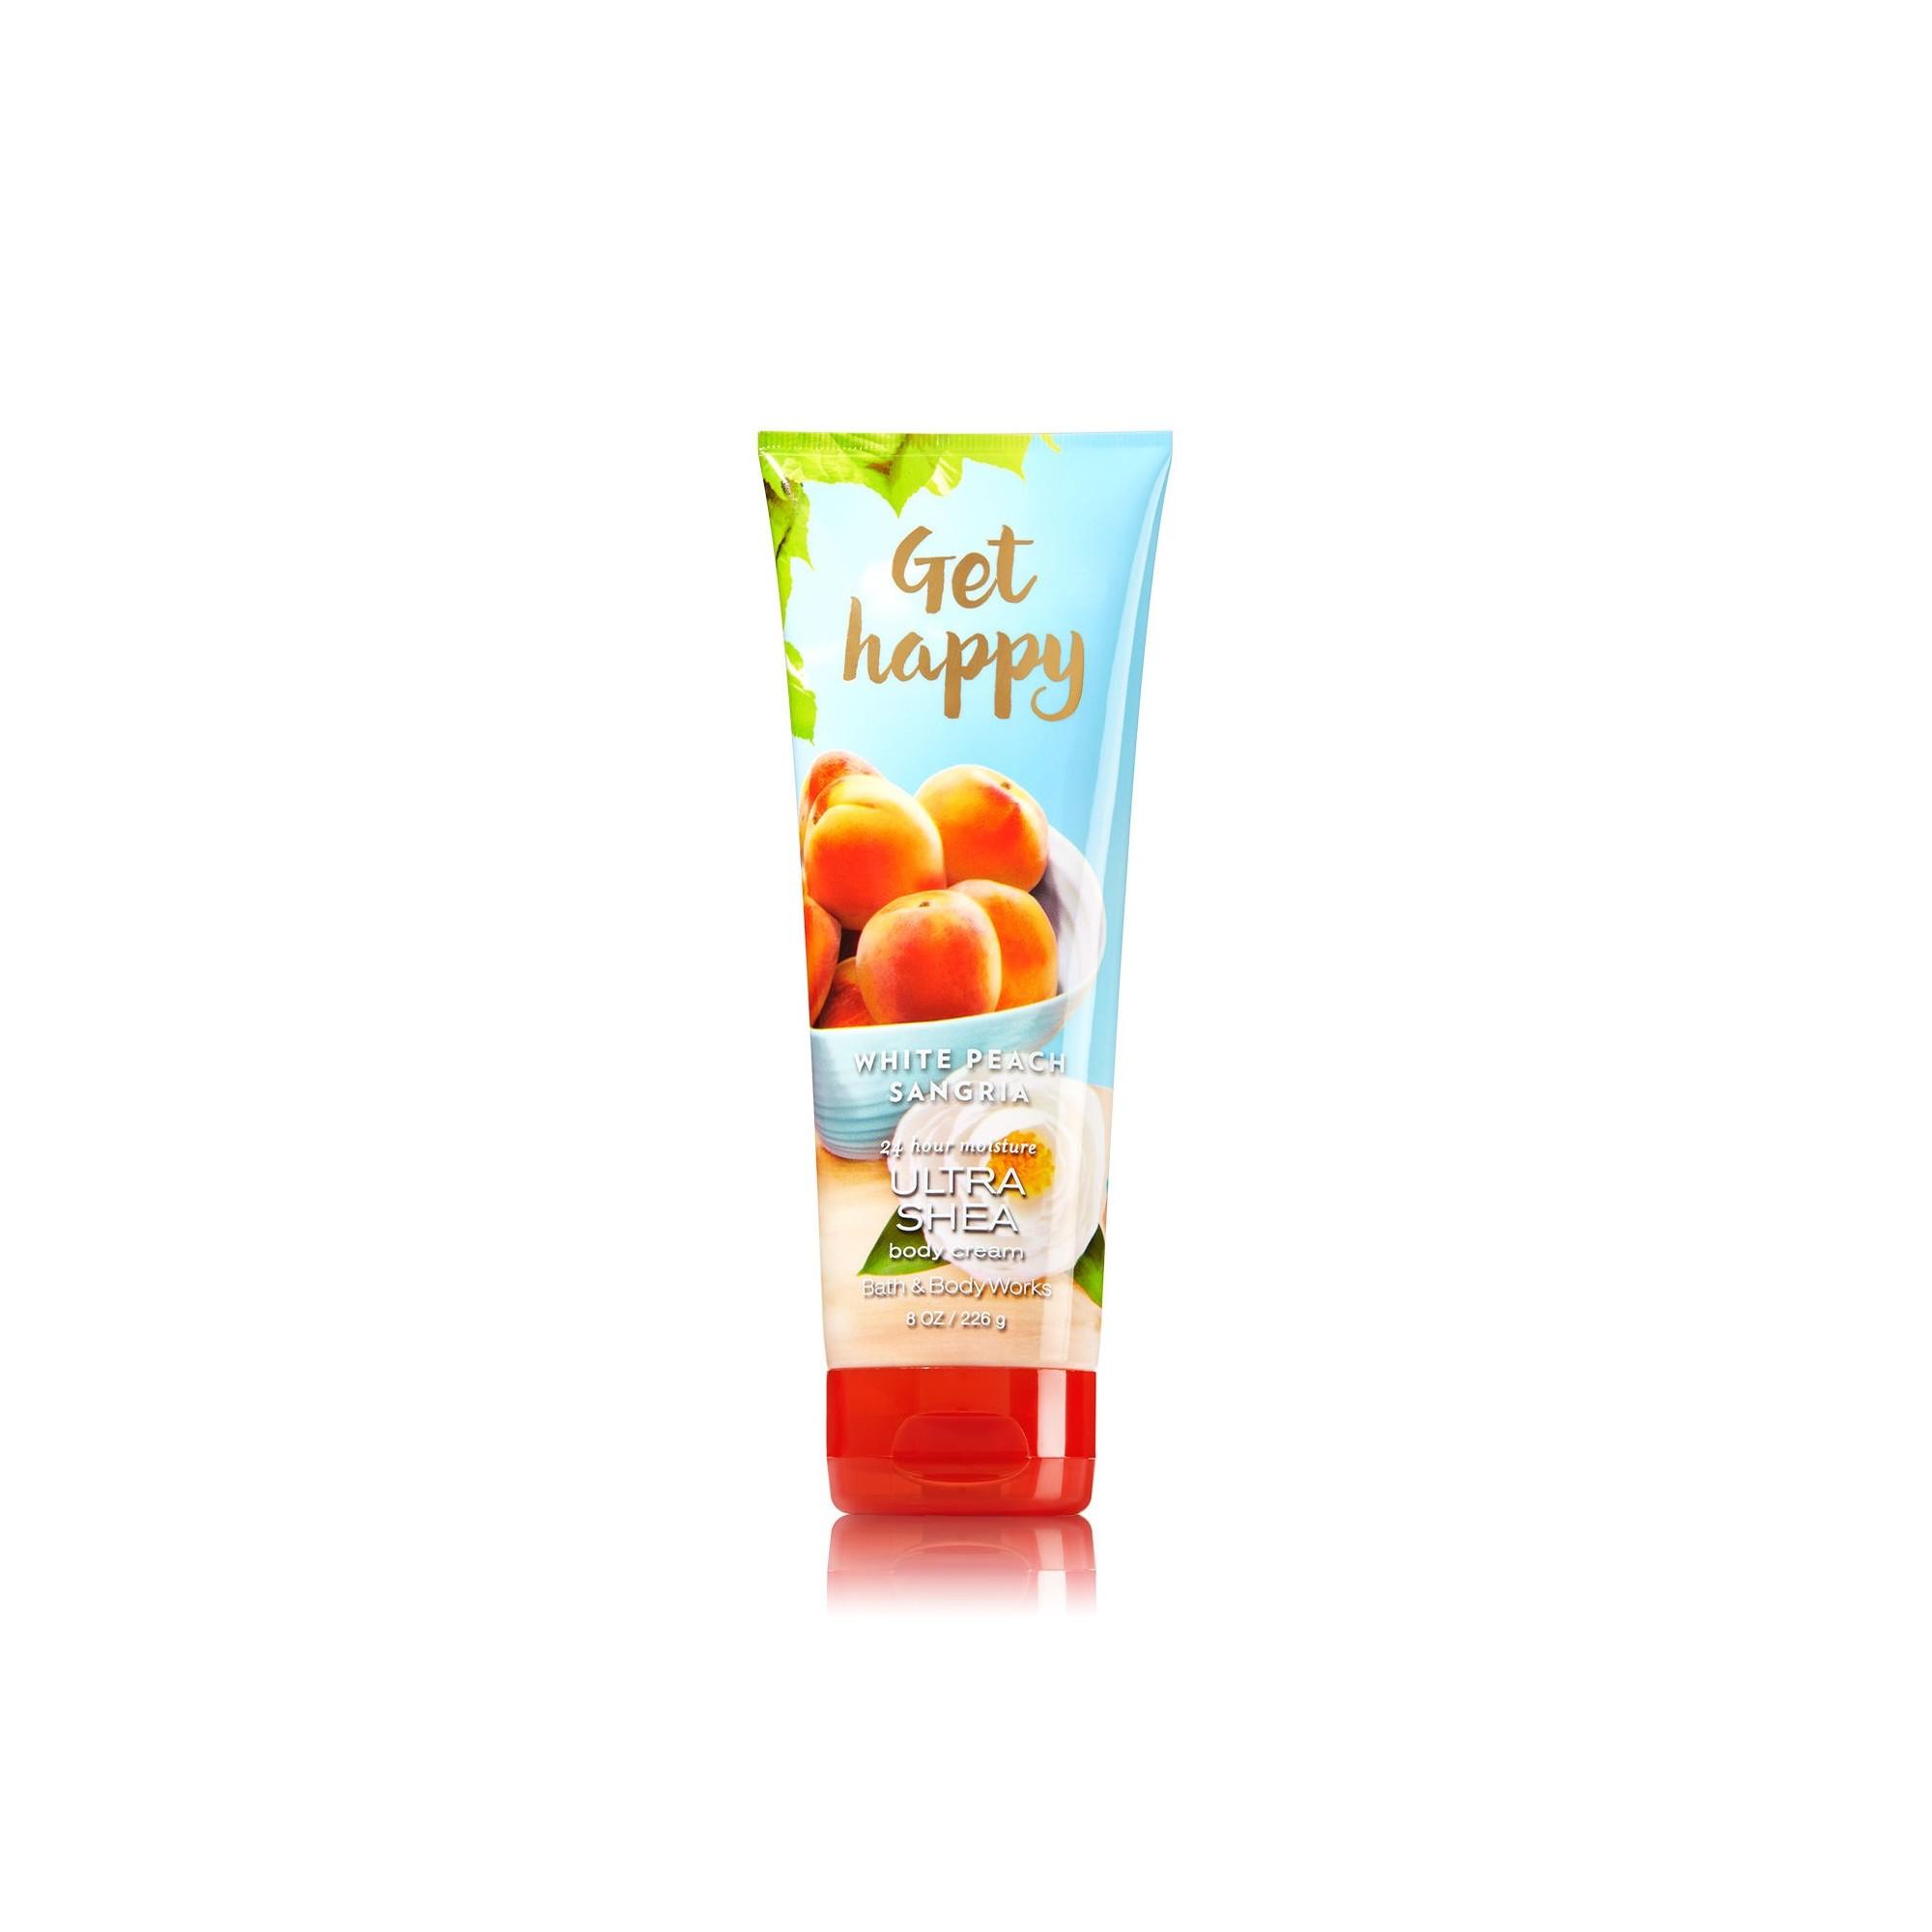 Bath & Body Works White Peach Sangria Ultra Shea Body Cream